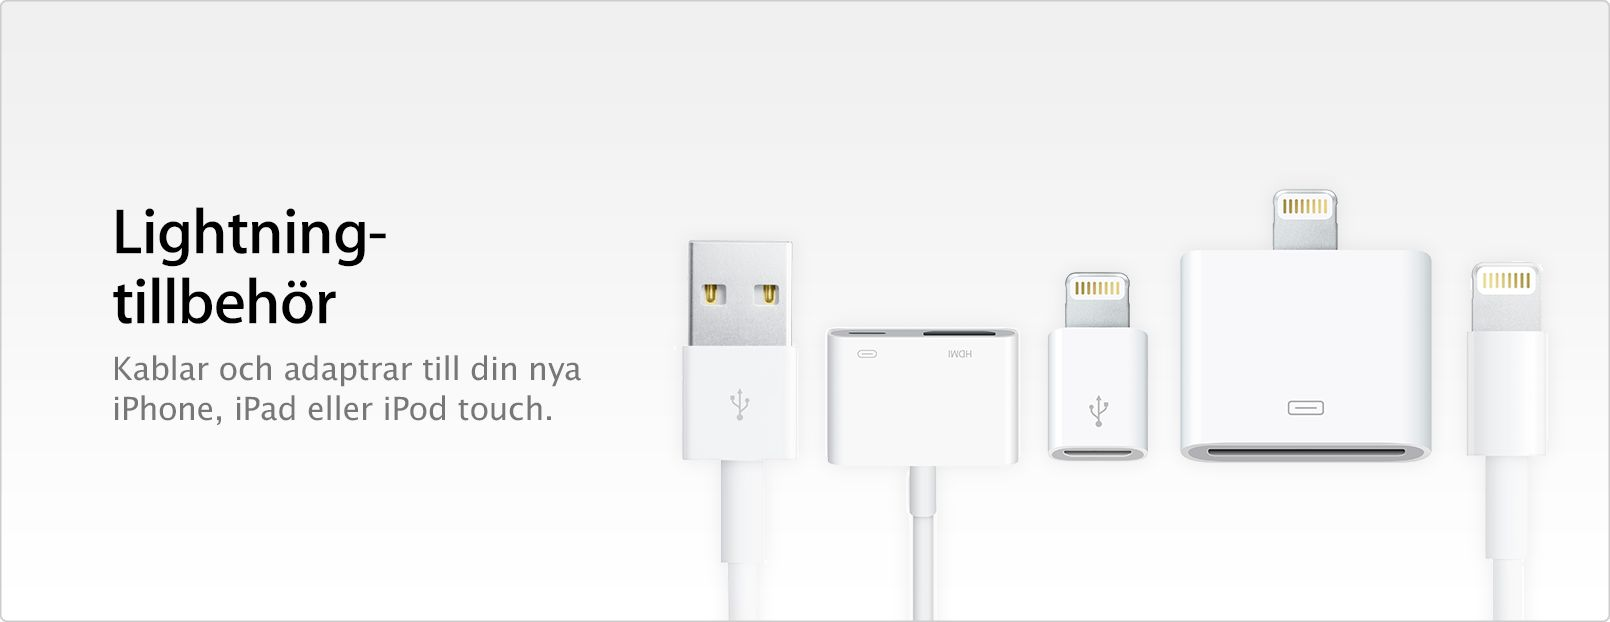 iPhone lightning laddare | Lightning (Iphone, Ipad) |